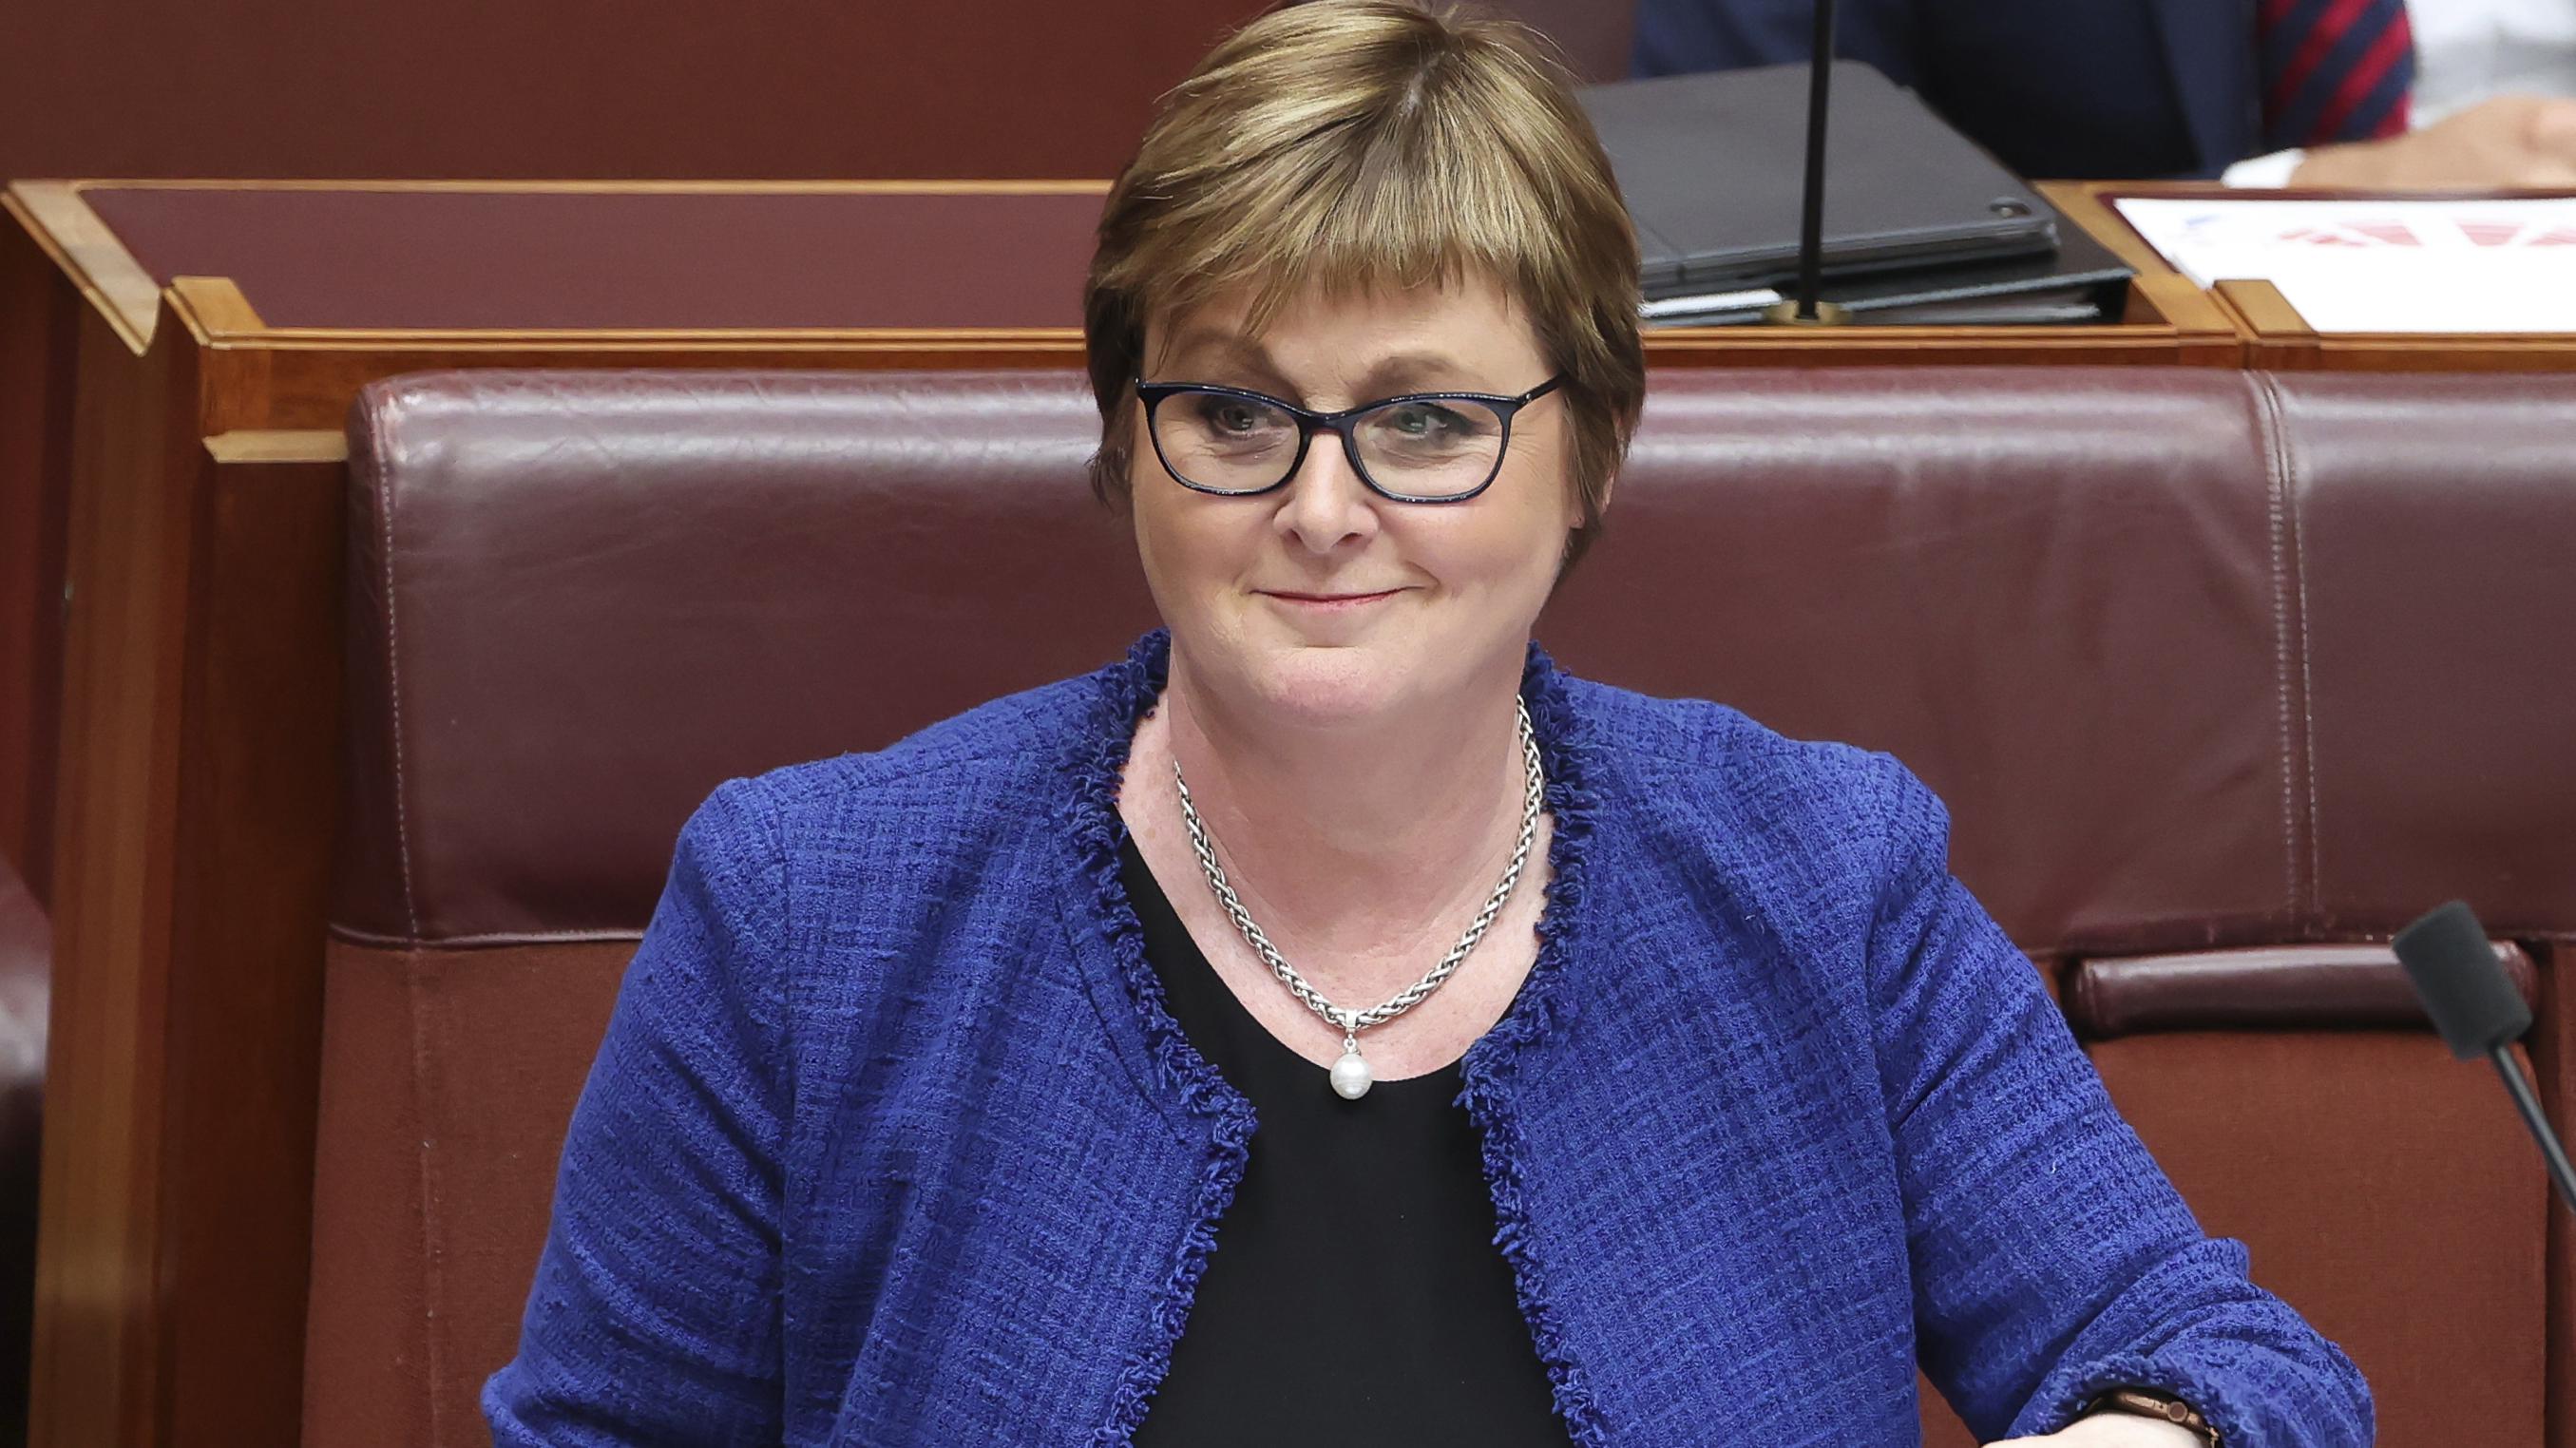 Brittany Higgins reacts after Defence Minister hospitalised